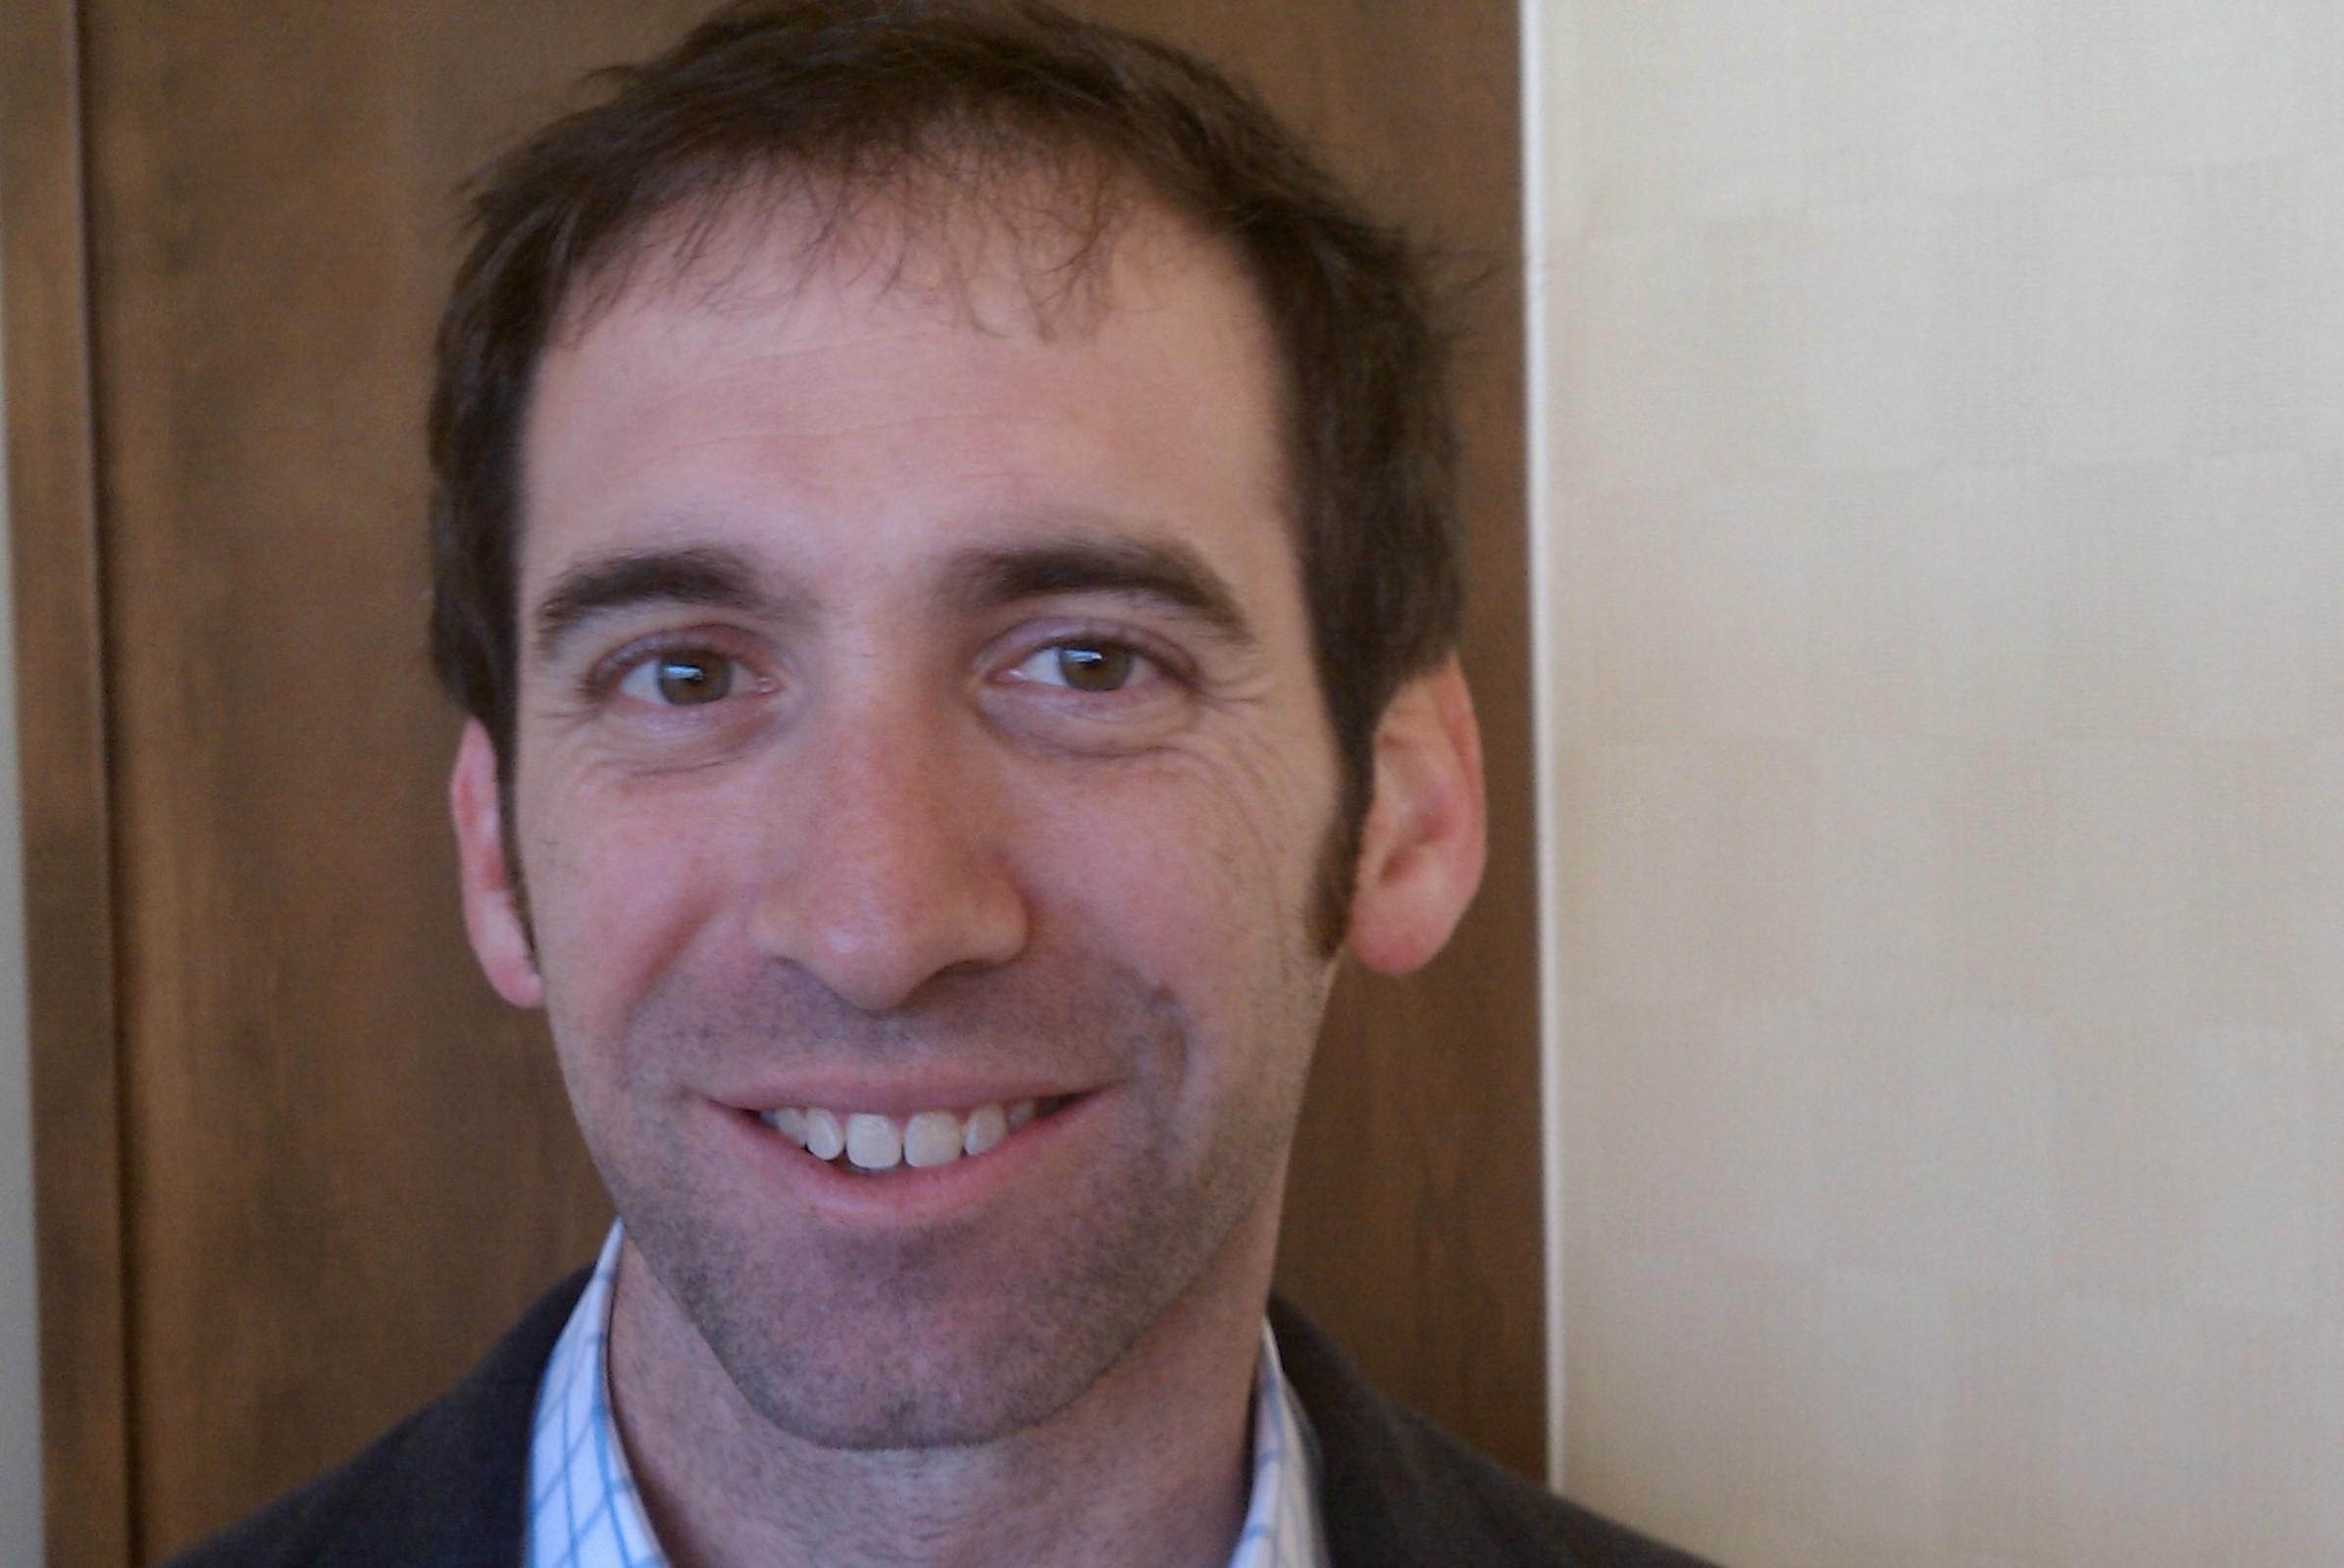 Nick Feamster of Georgia Tech